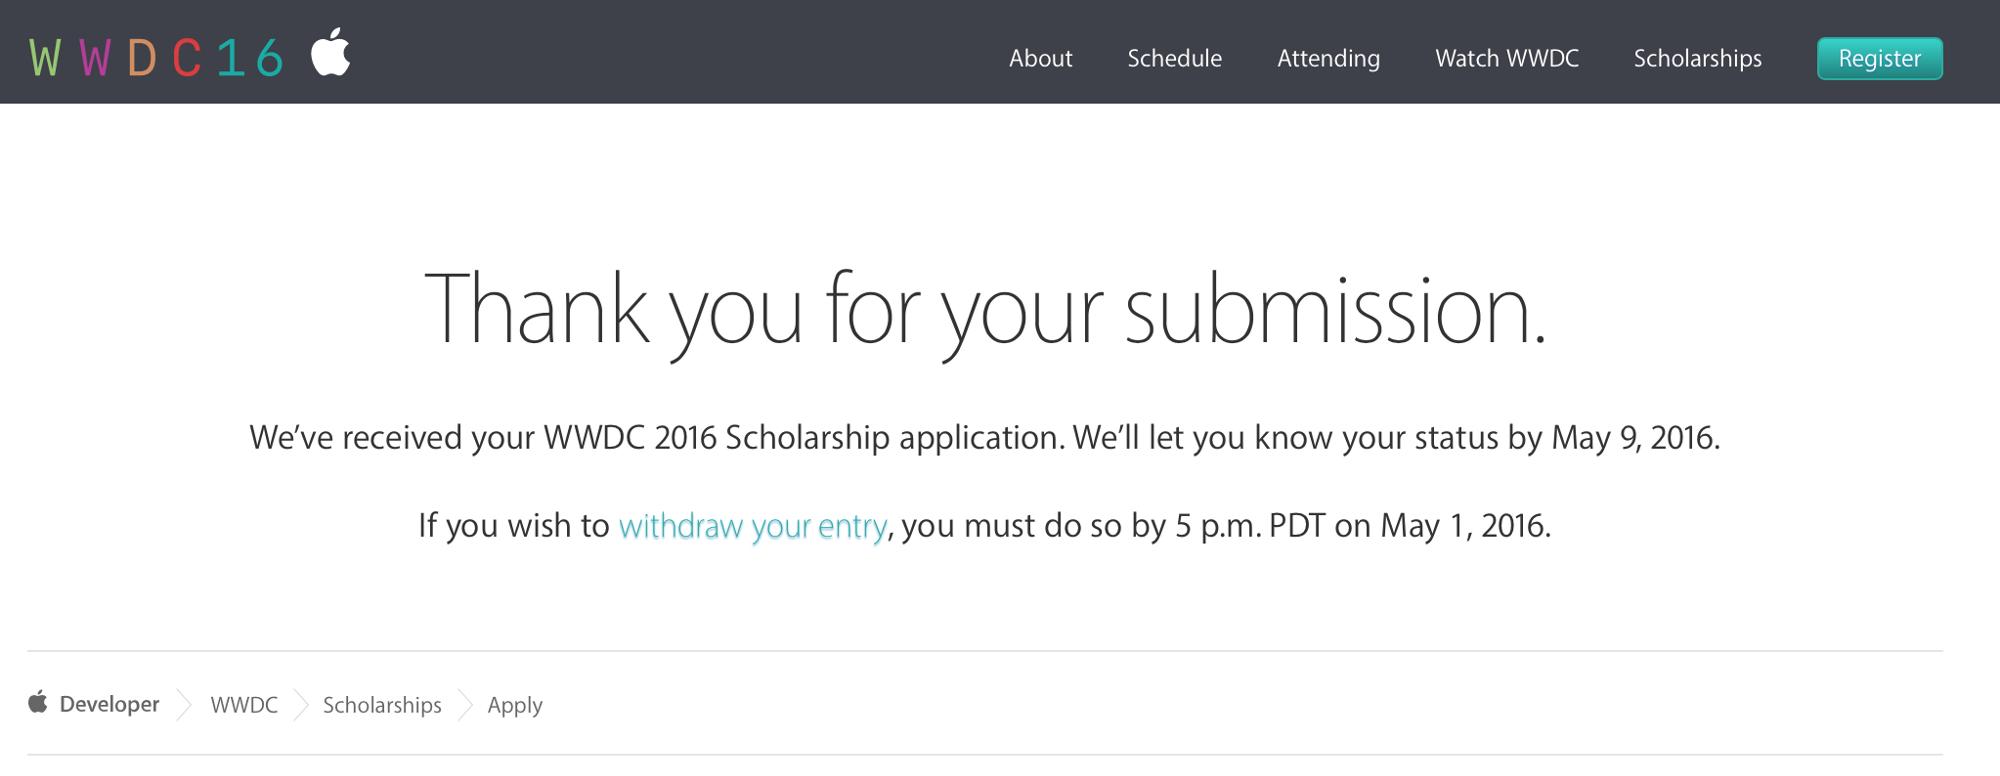 Applying To The WWDC Scholarship